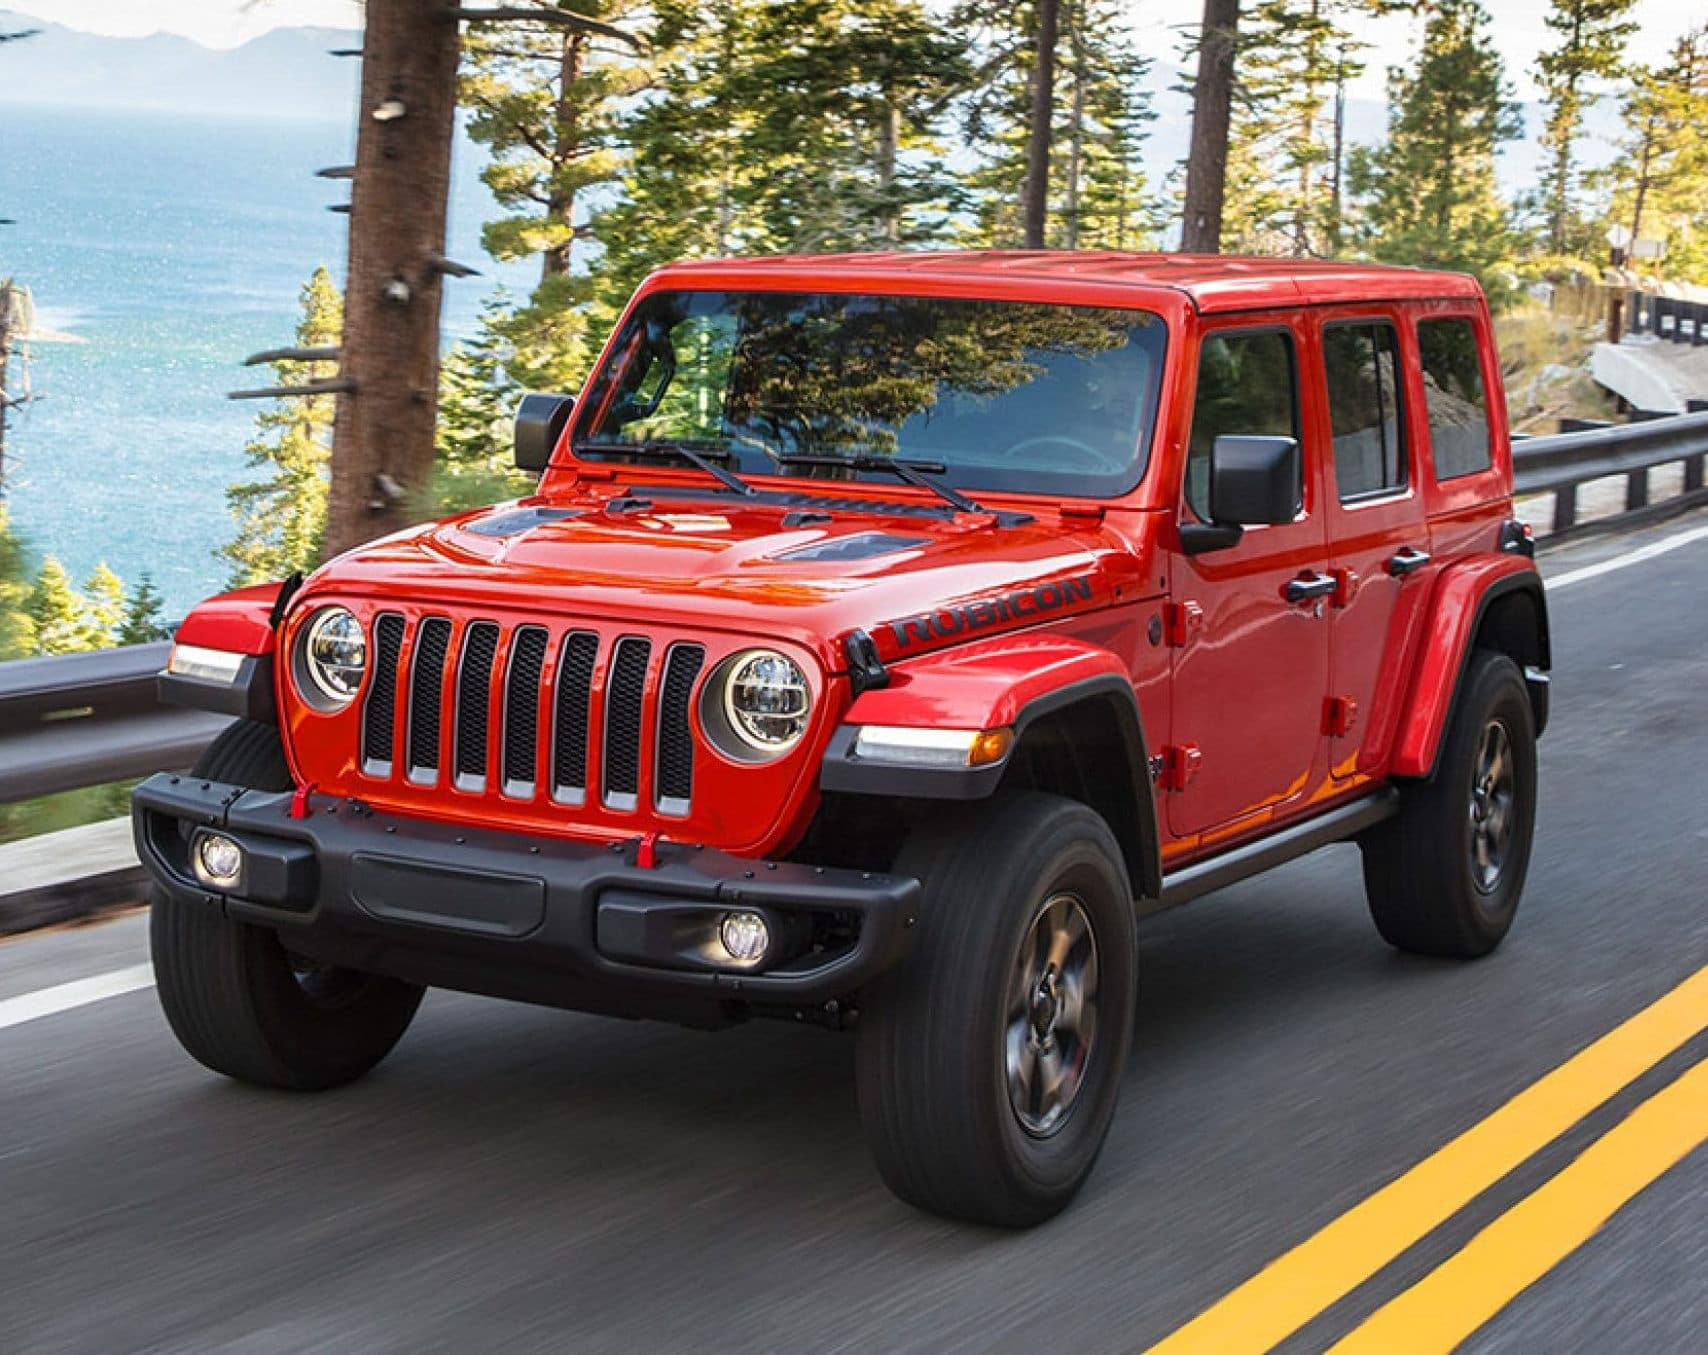 2021 Jeep Wrangler Near Me